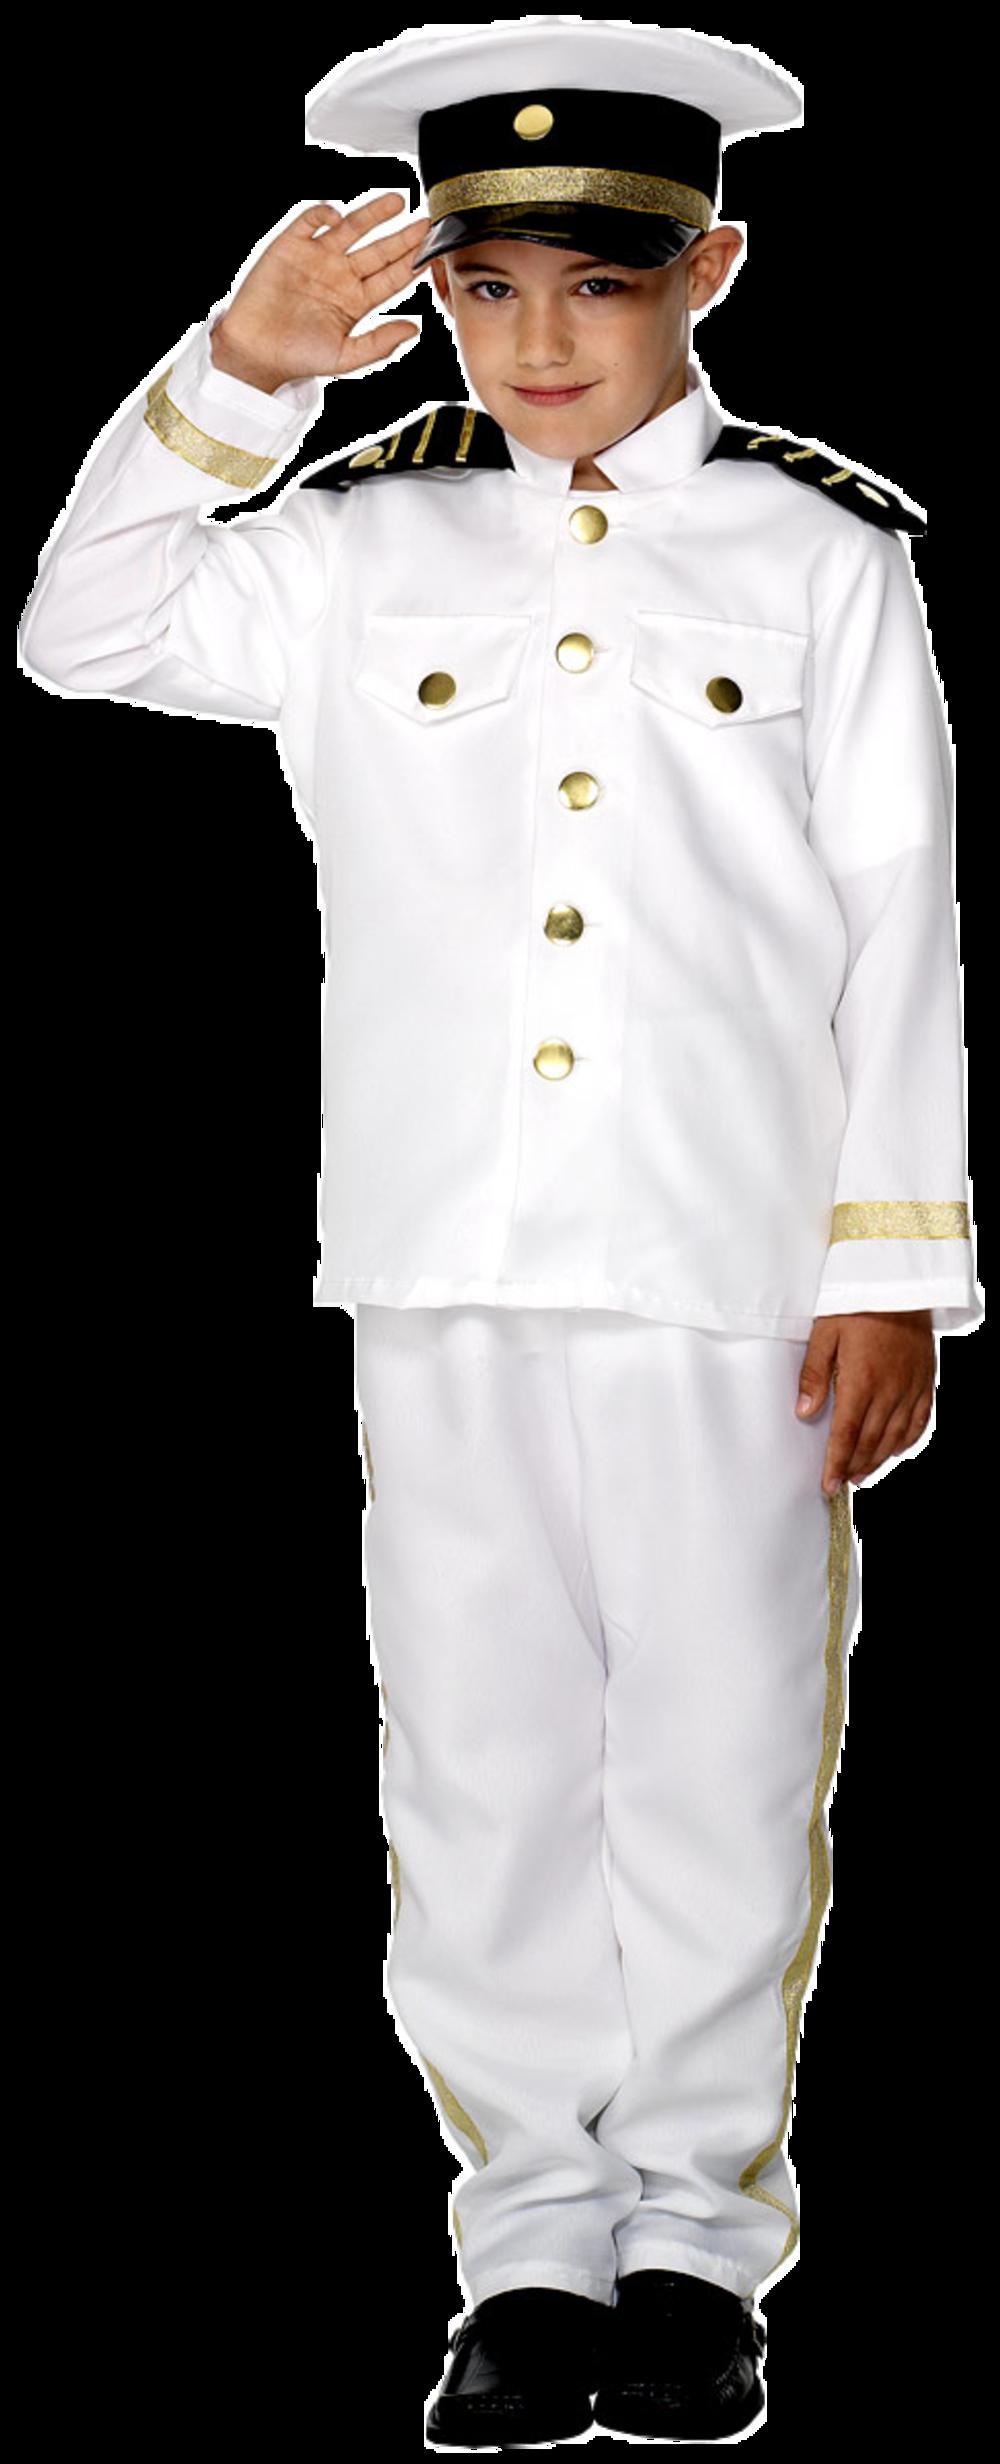 Captain Boy Fancy Dress Kids Naval Officer Sailor Uniform Costume Childrens 7-12